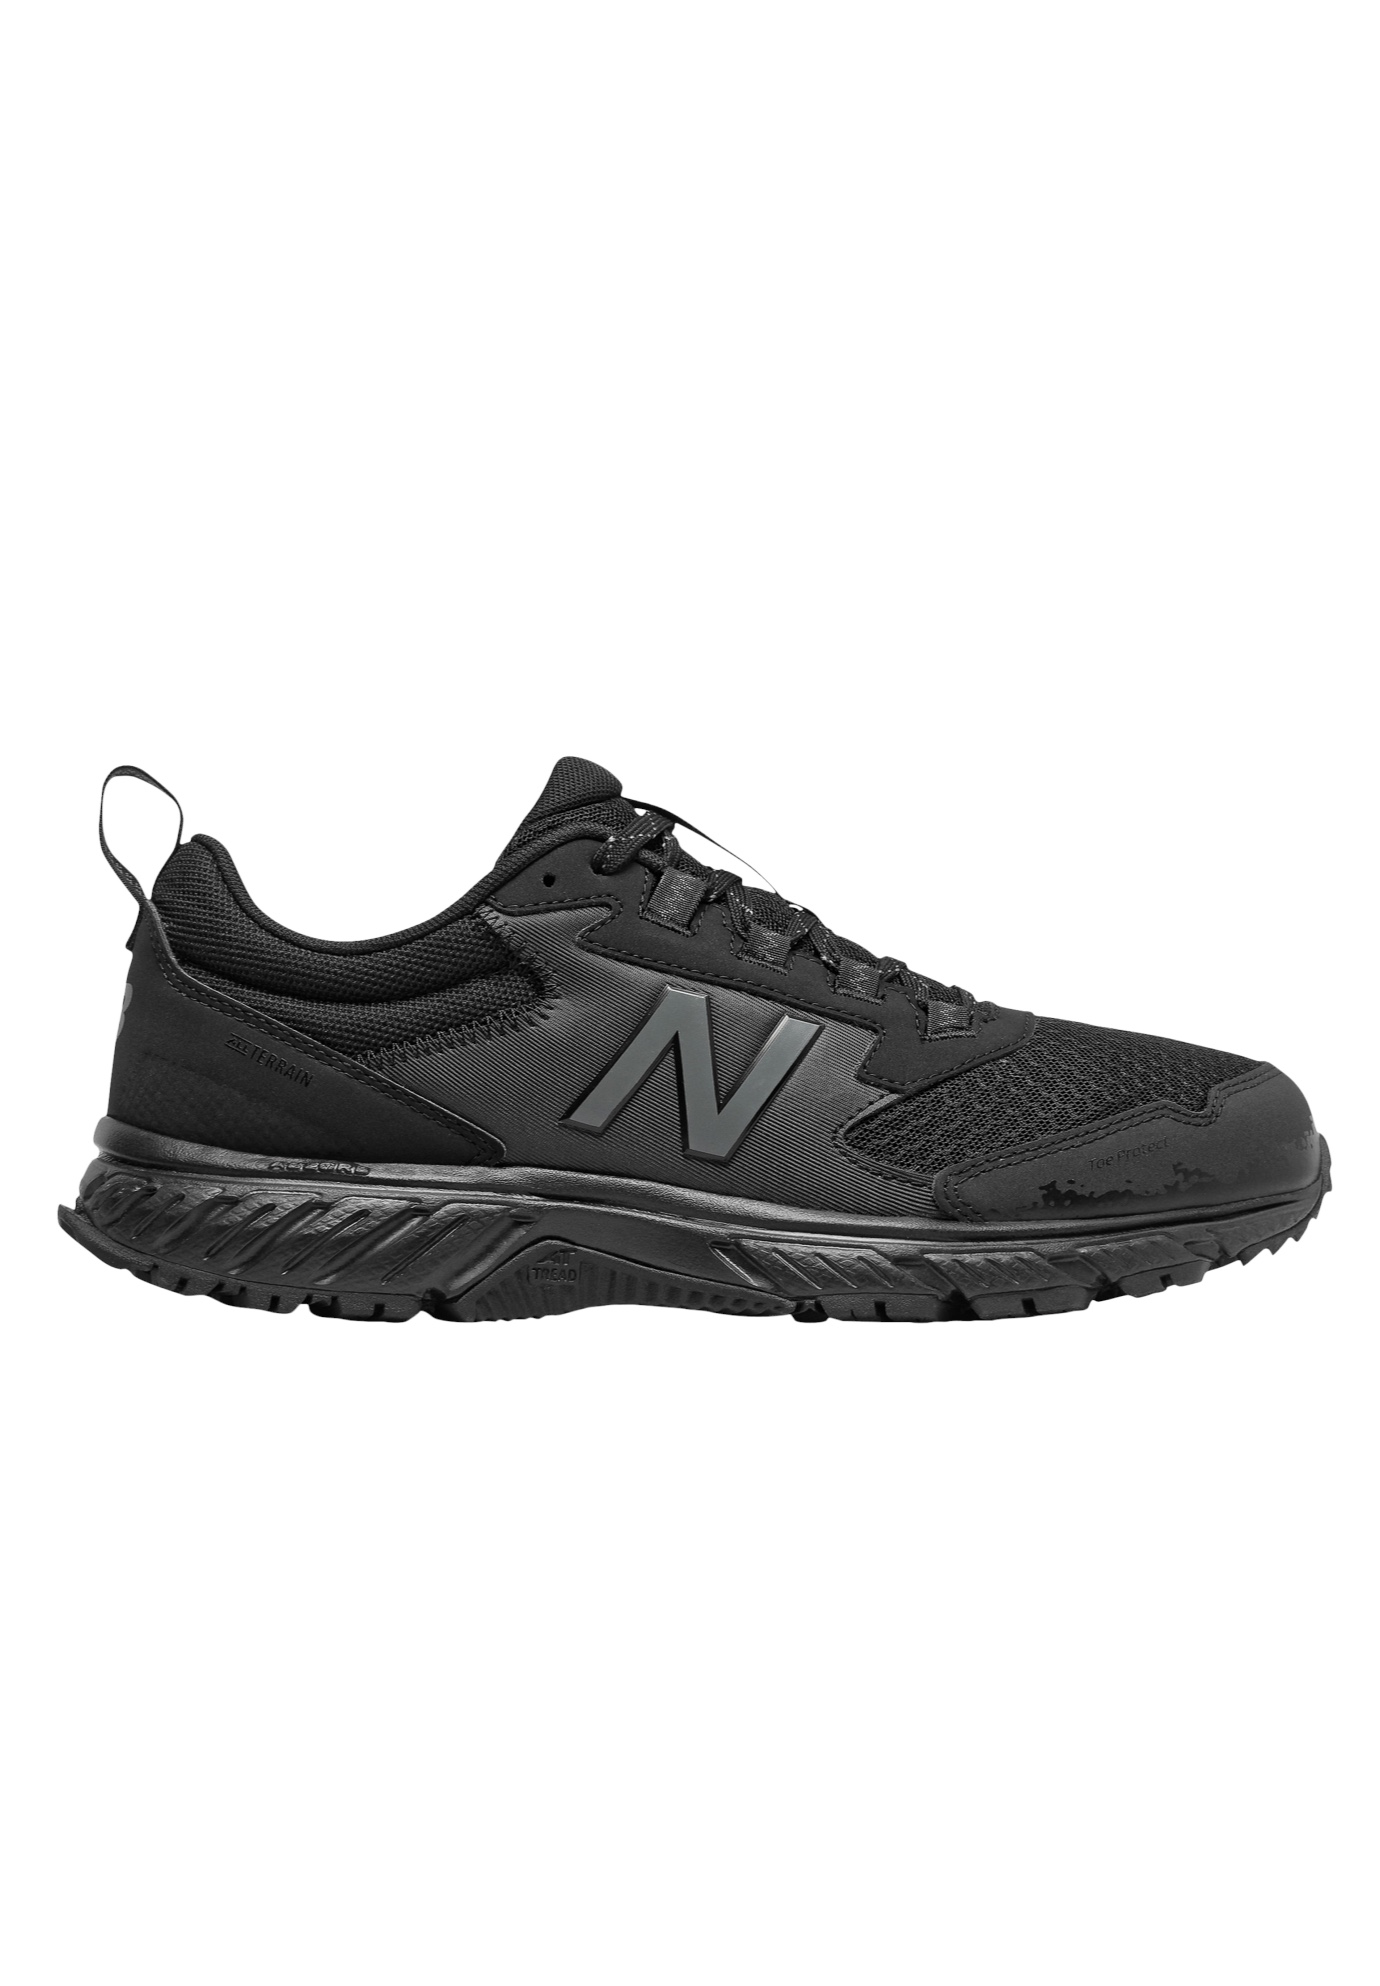 Balance 510V4 Trail Running Sneakers